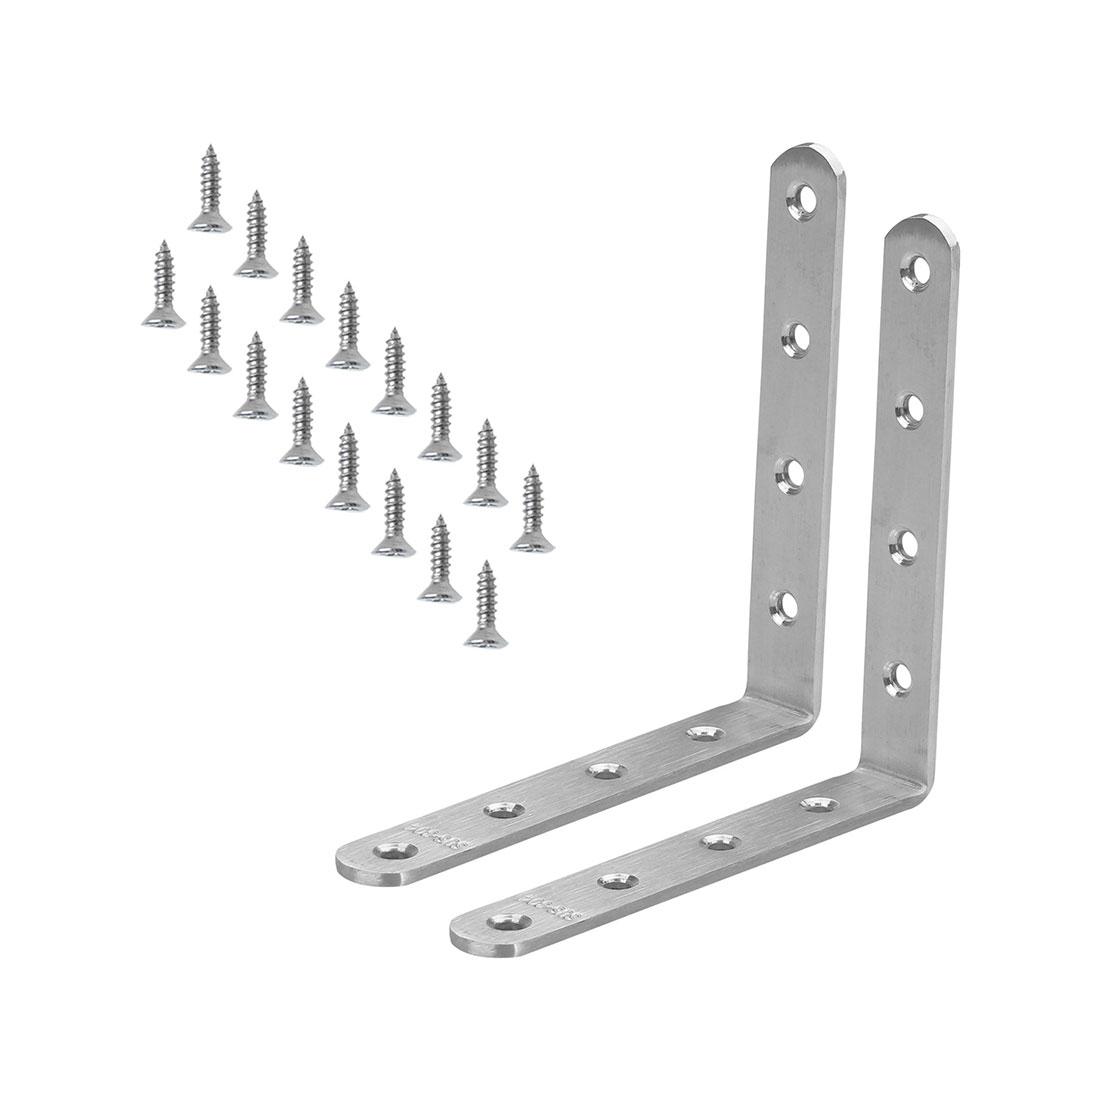 Angle Bracket Stainless Steel Brace Fastener Support w Screws 150 x 150mm, 2pcs